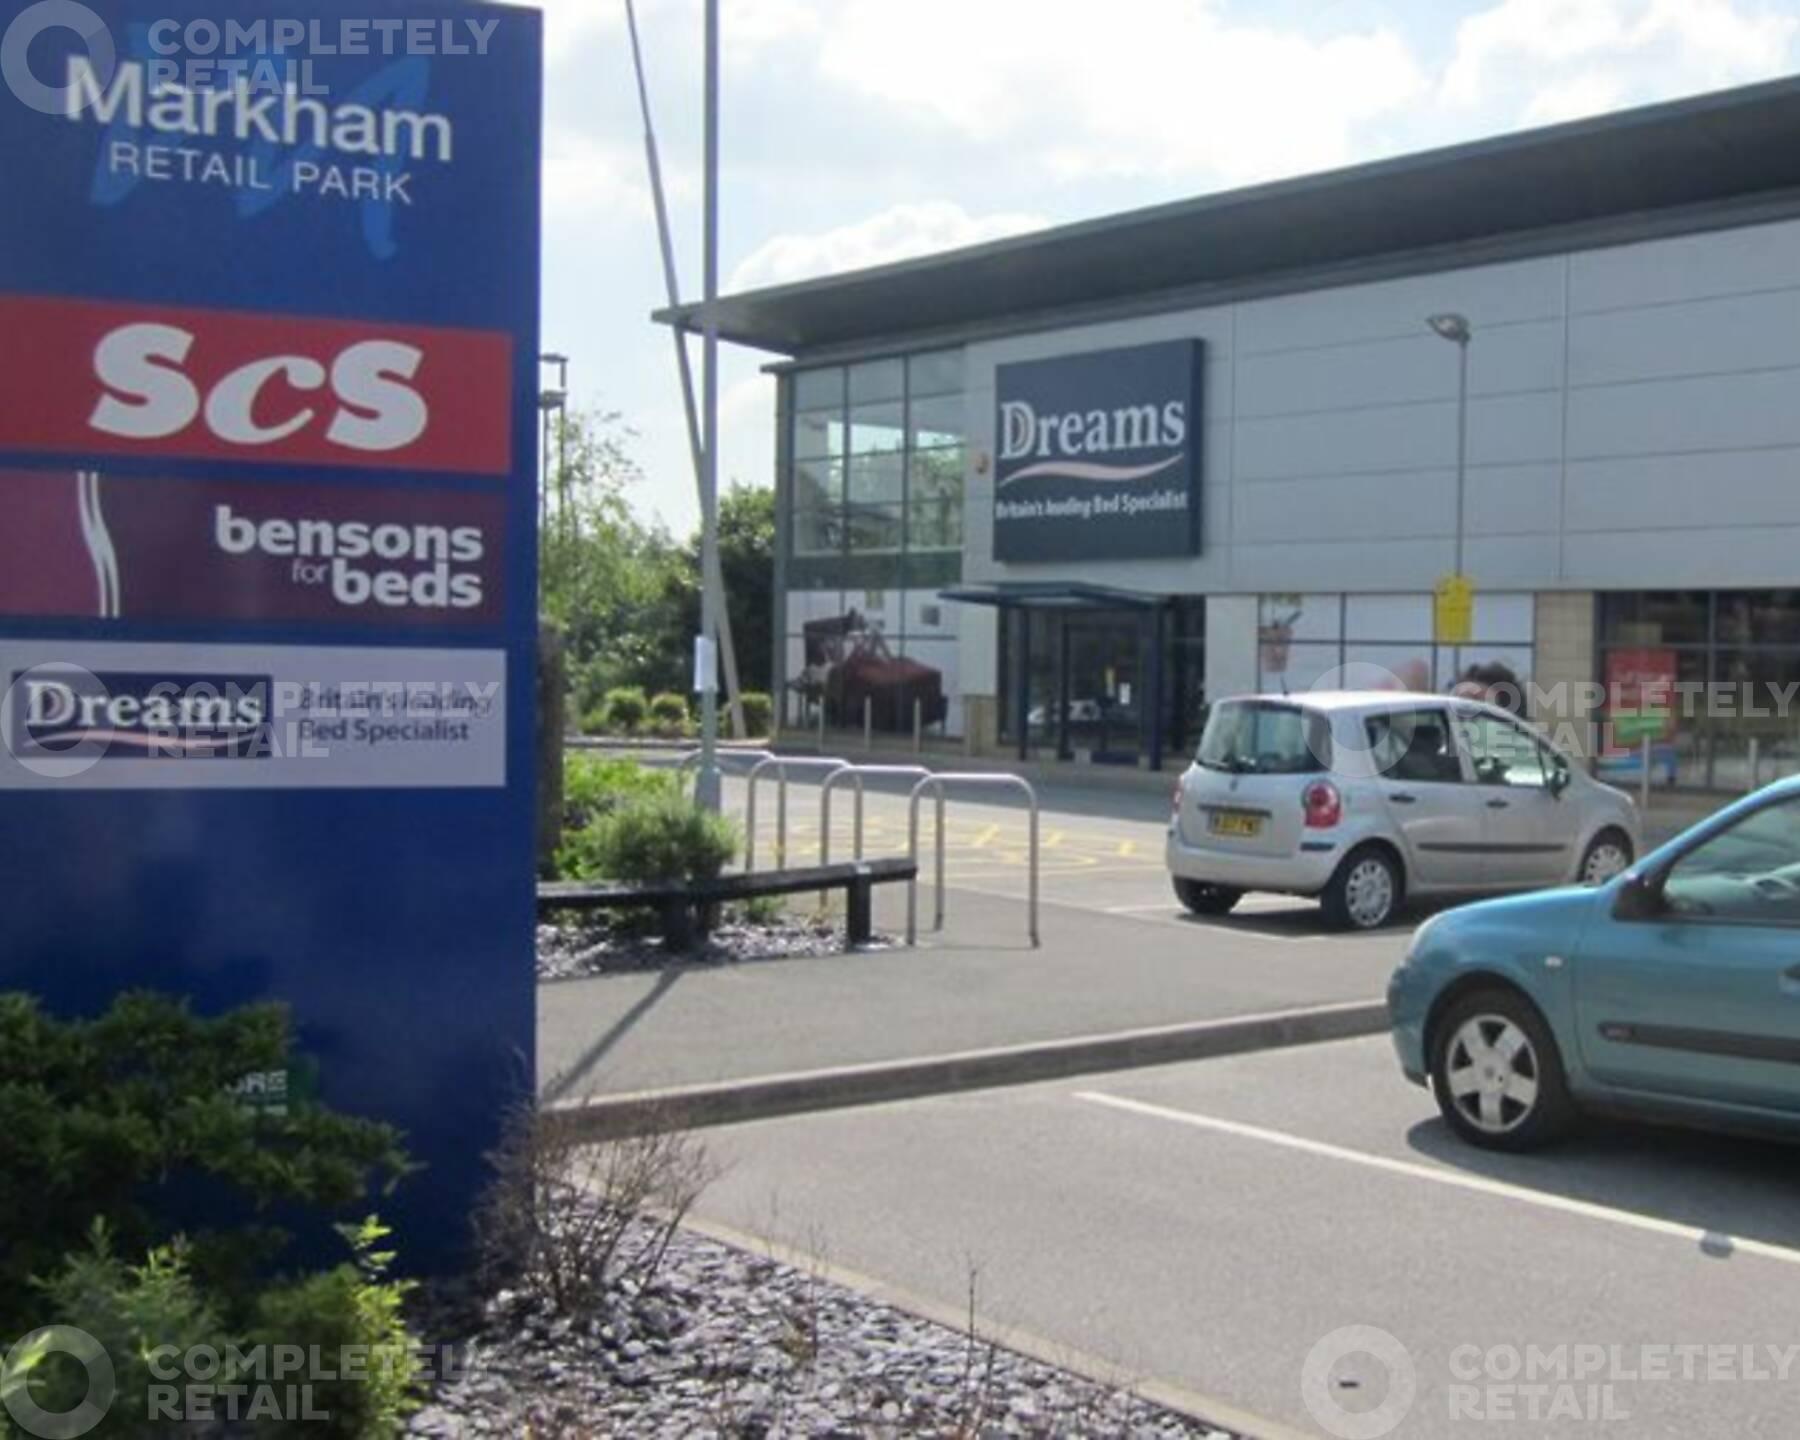 Markham Retail Park